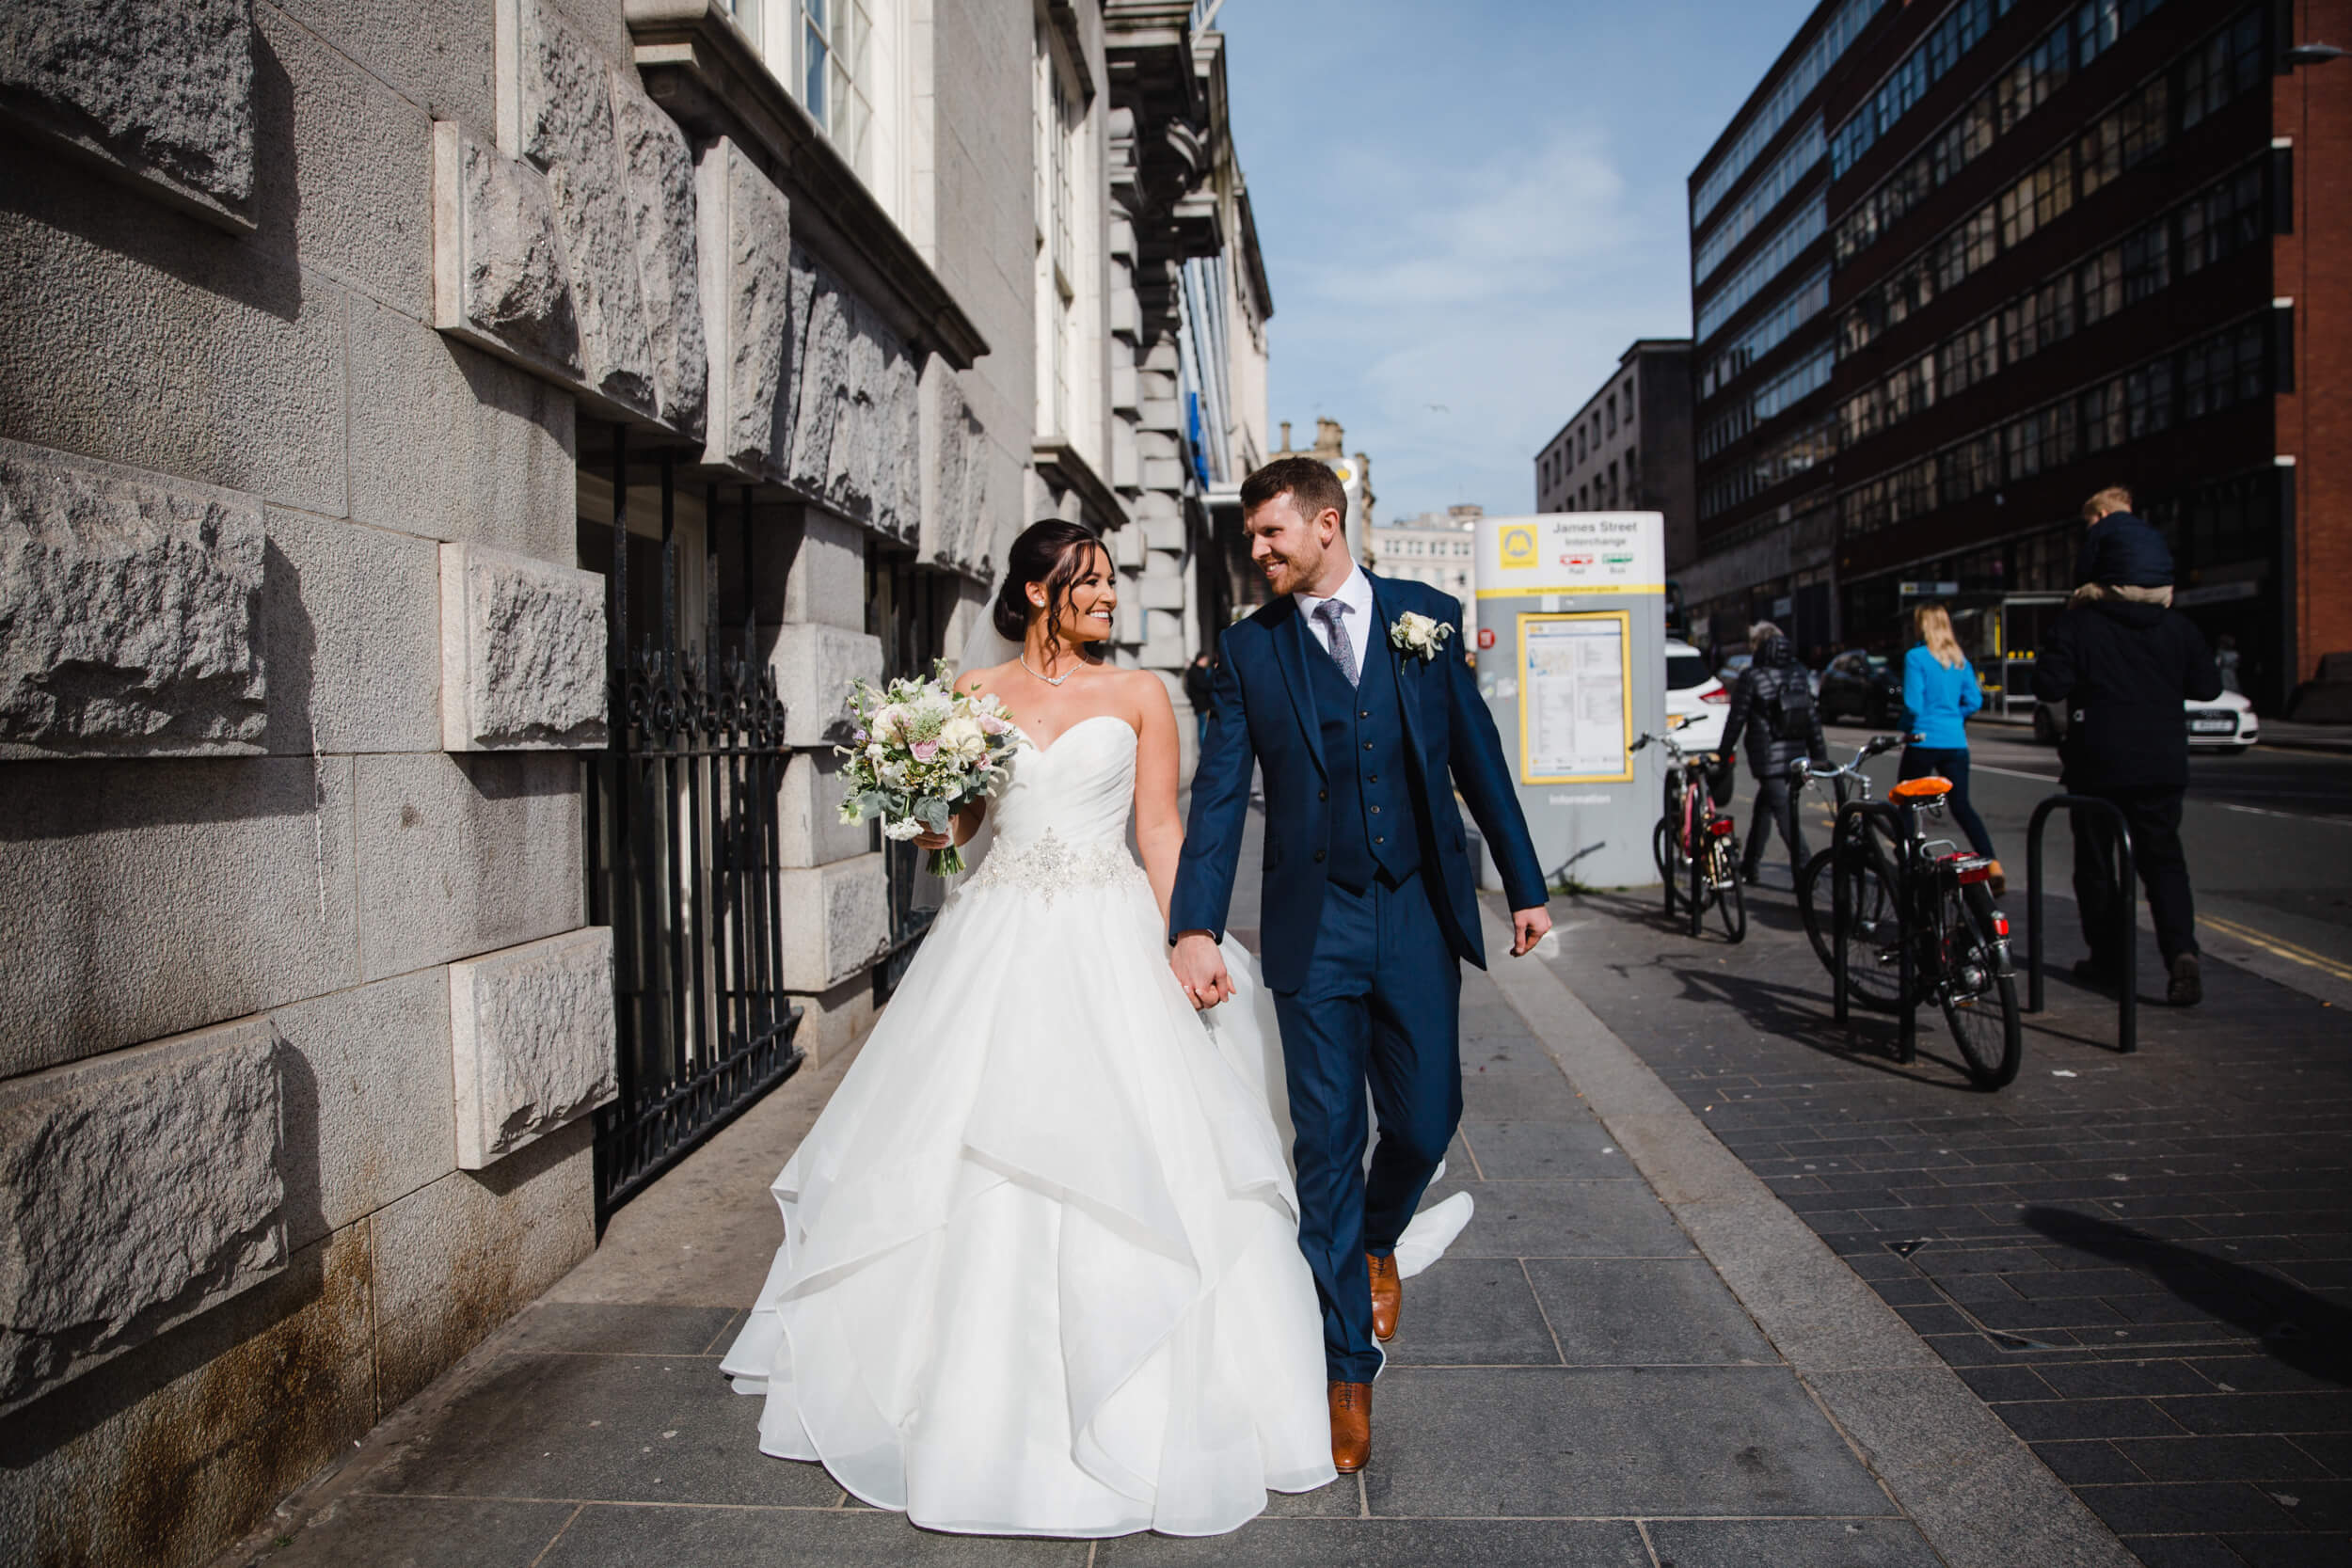 30_James_Street_Hotel_Wedding_Venue_029.jpg